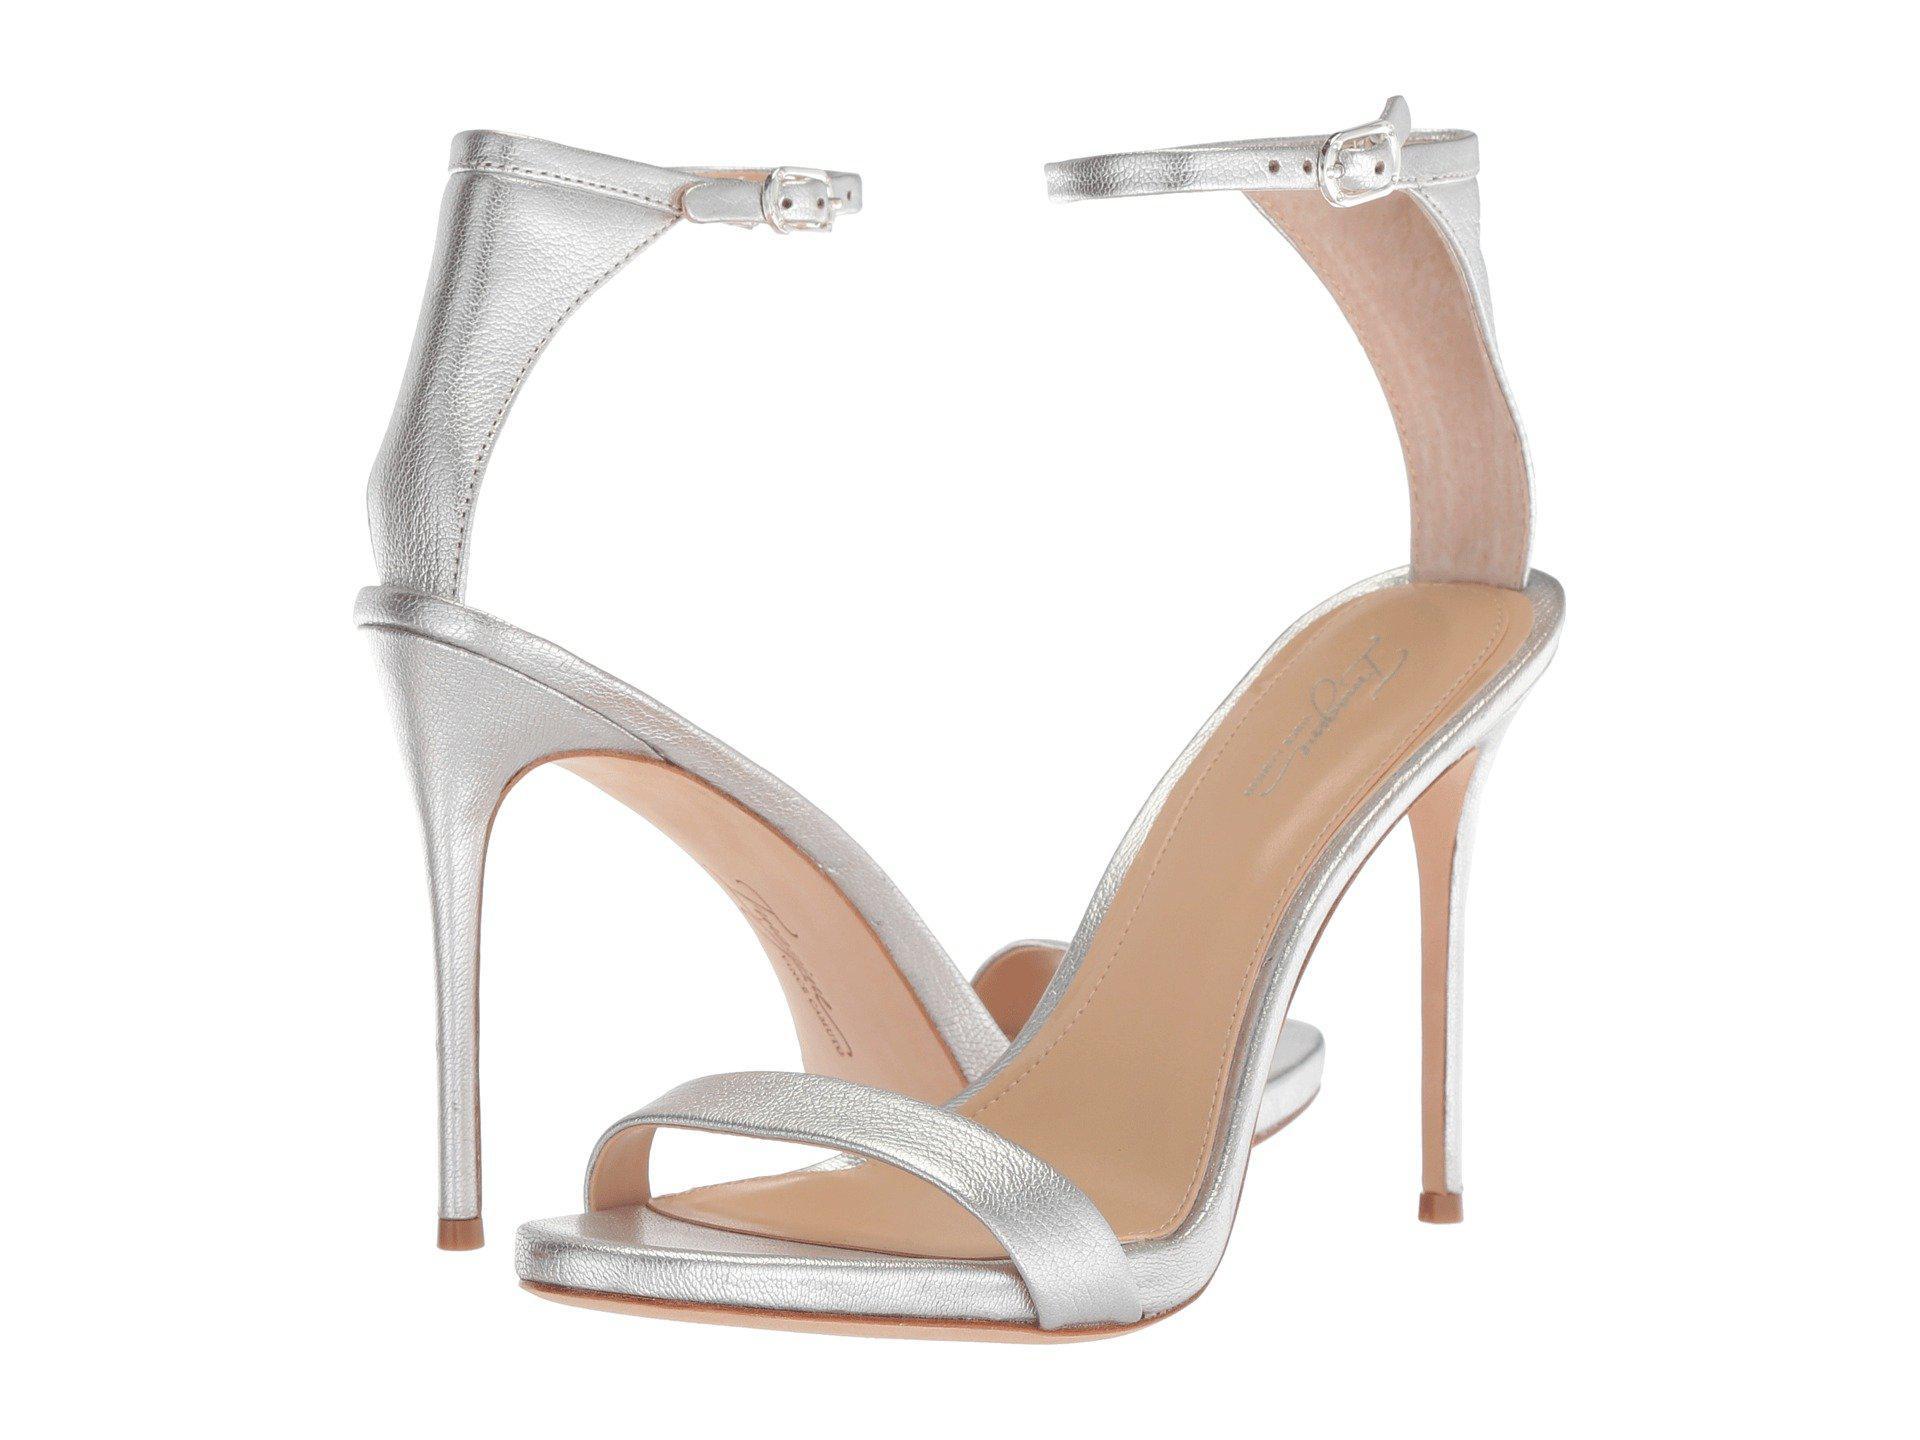 Imagine Vince Camuto Dacia 2 Metallic Ankle Strap Dress Sandals AWxSL